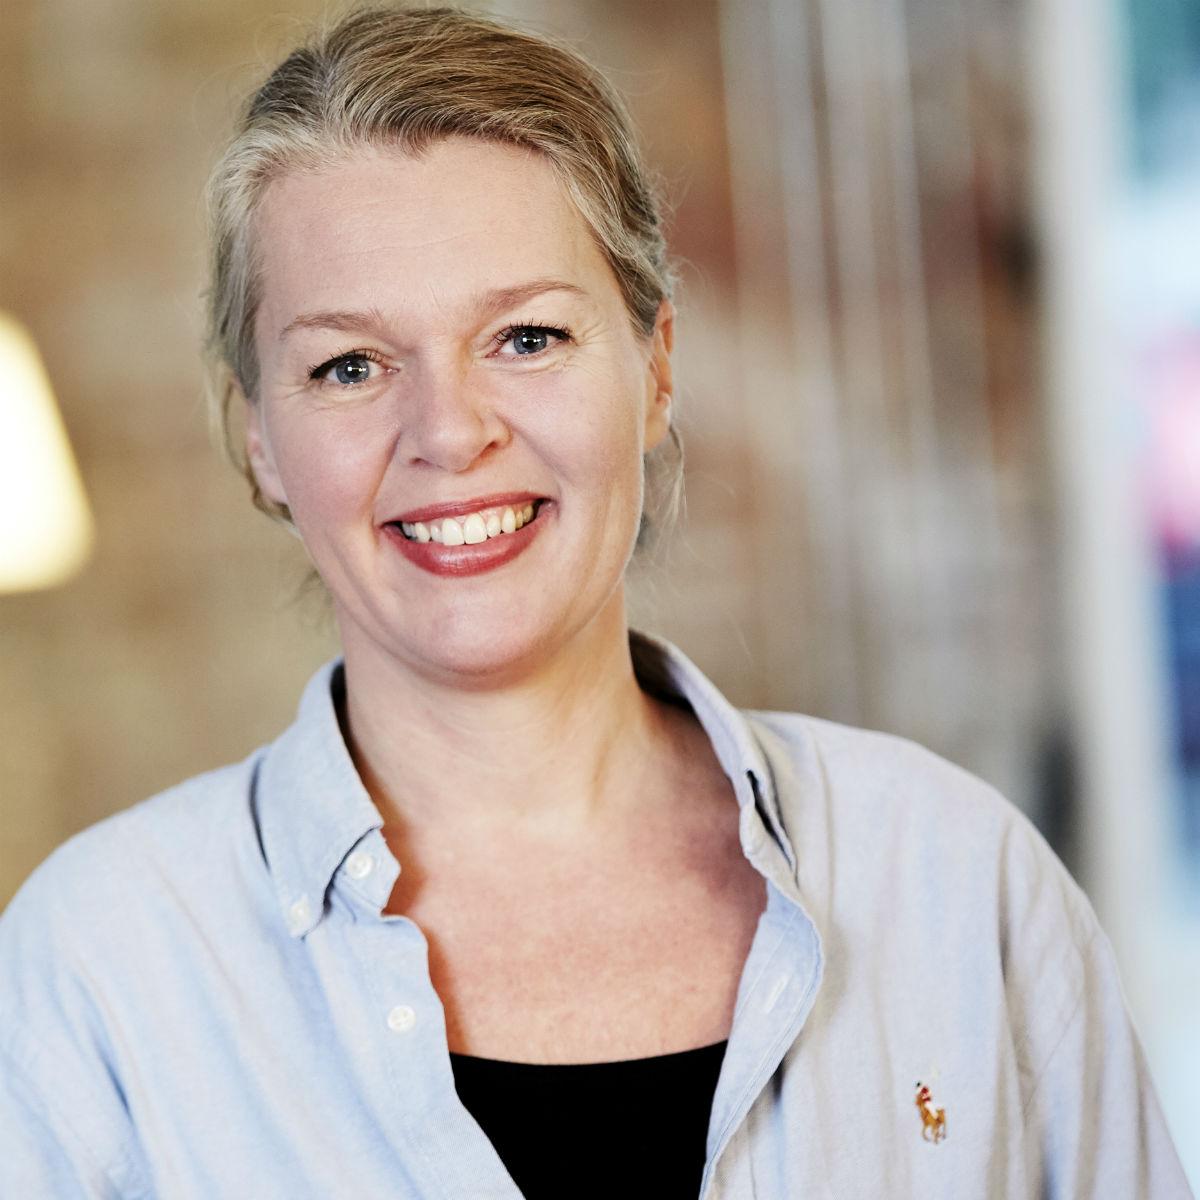 Mia Søiberg medejer og chefkonsulent hos Albatros supervision